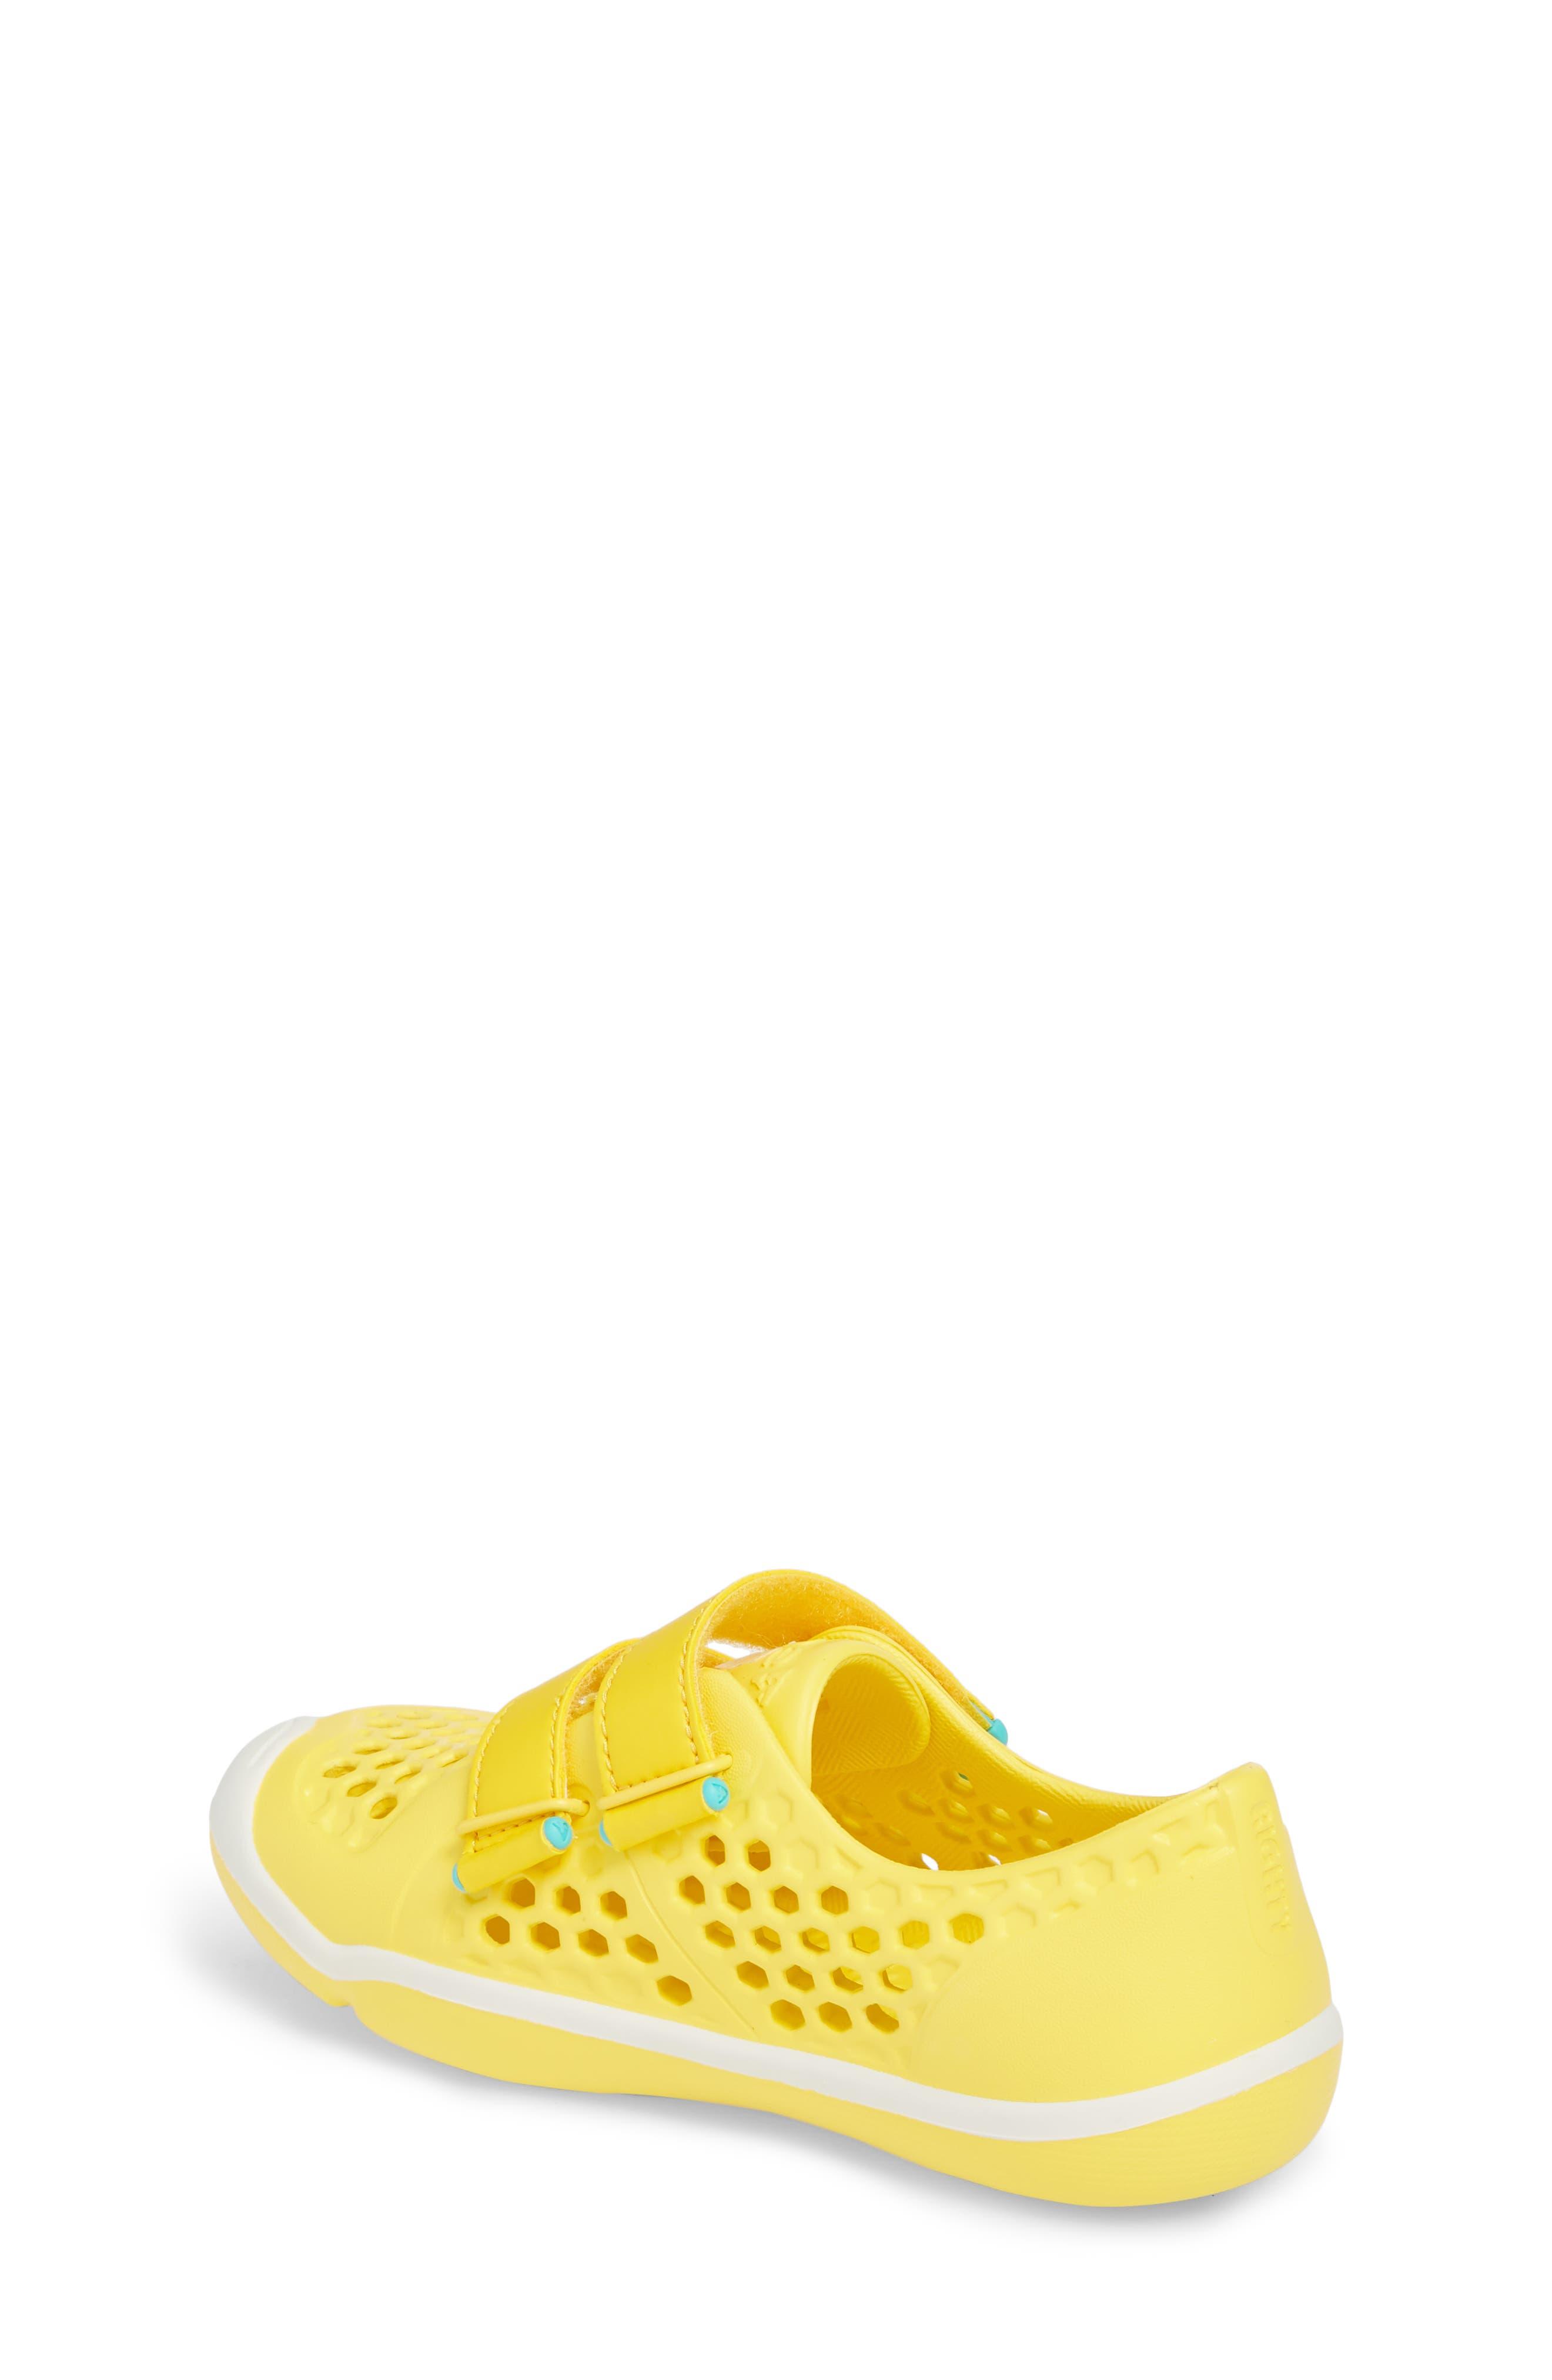 Mimo Customizable Sneaker,                             Alternate thumbnail 2, color,                             Dandelion